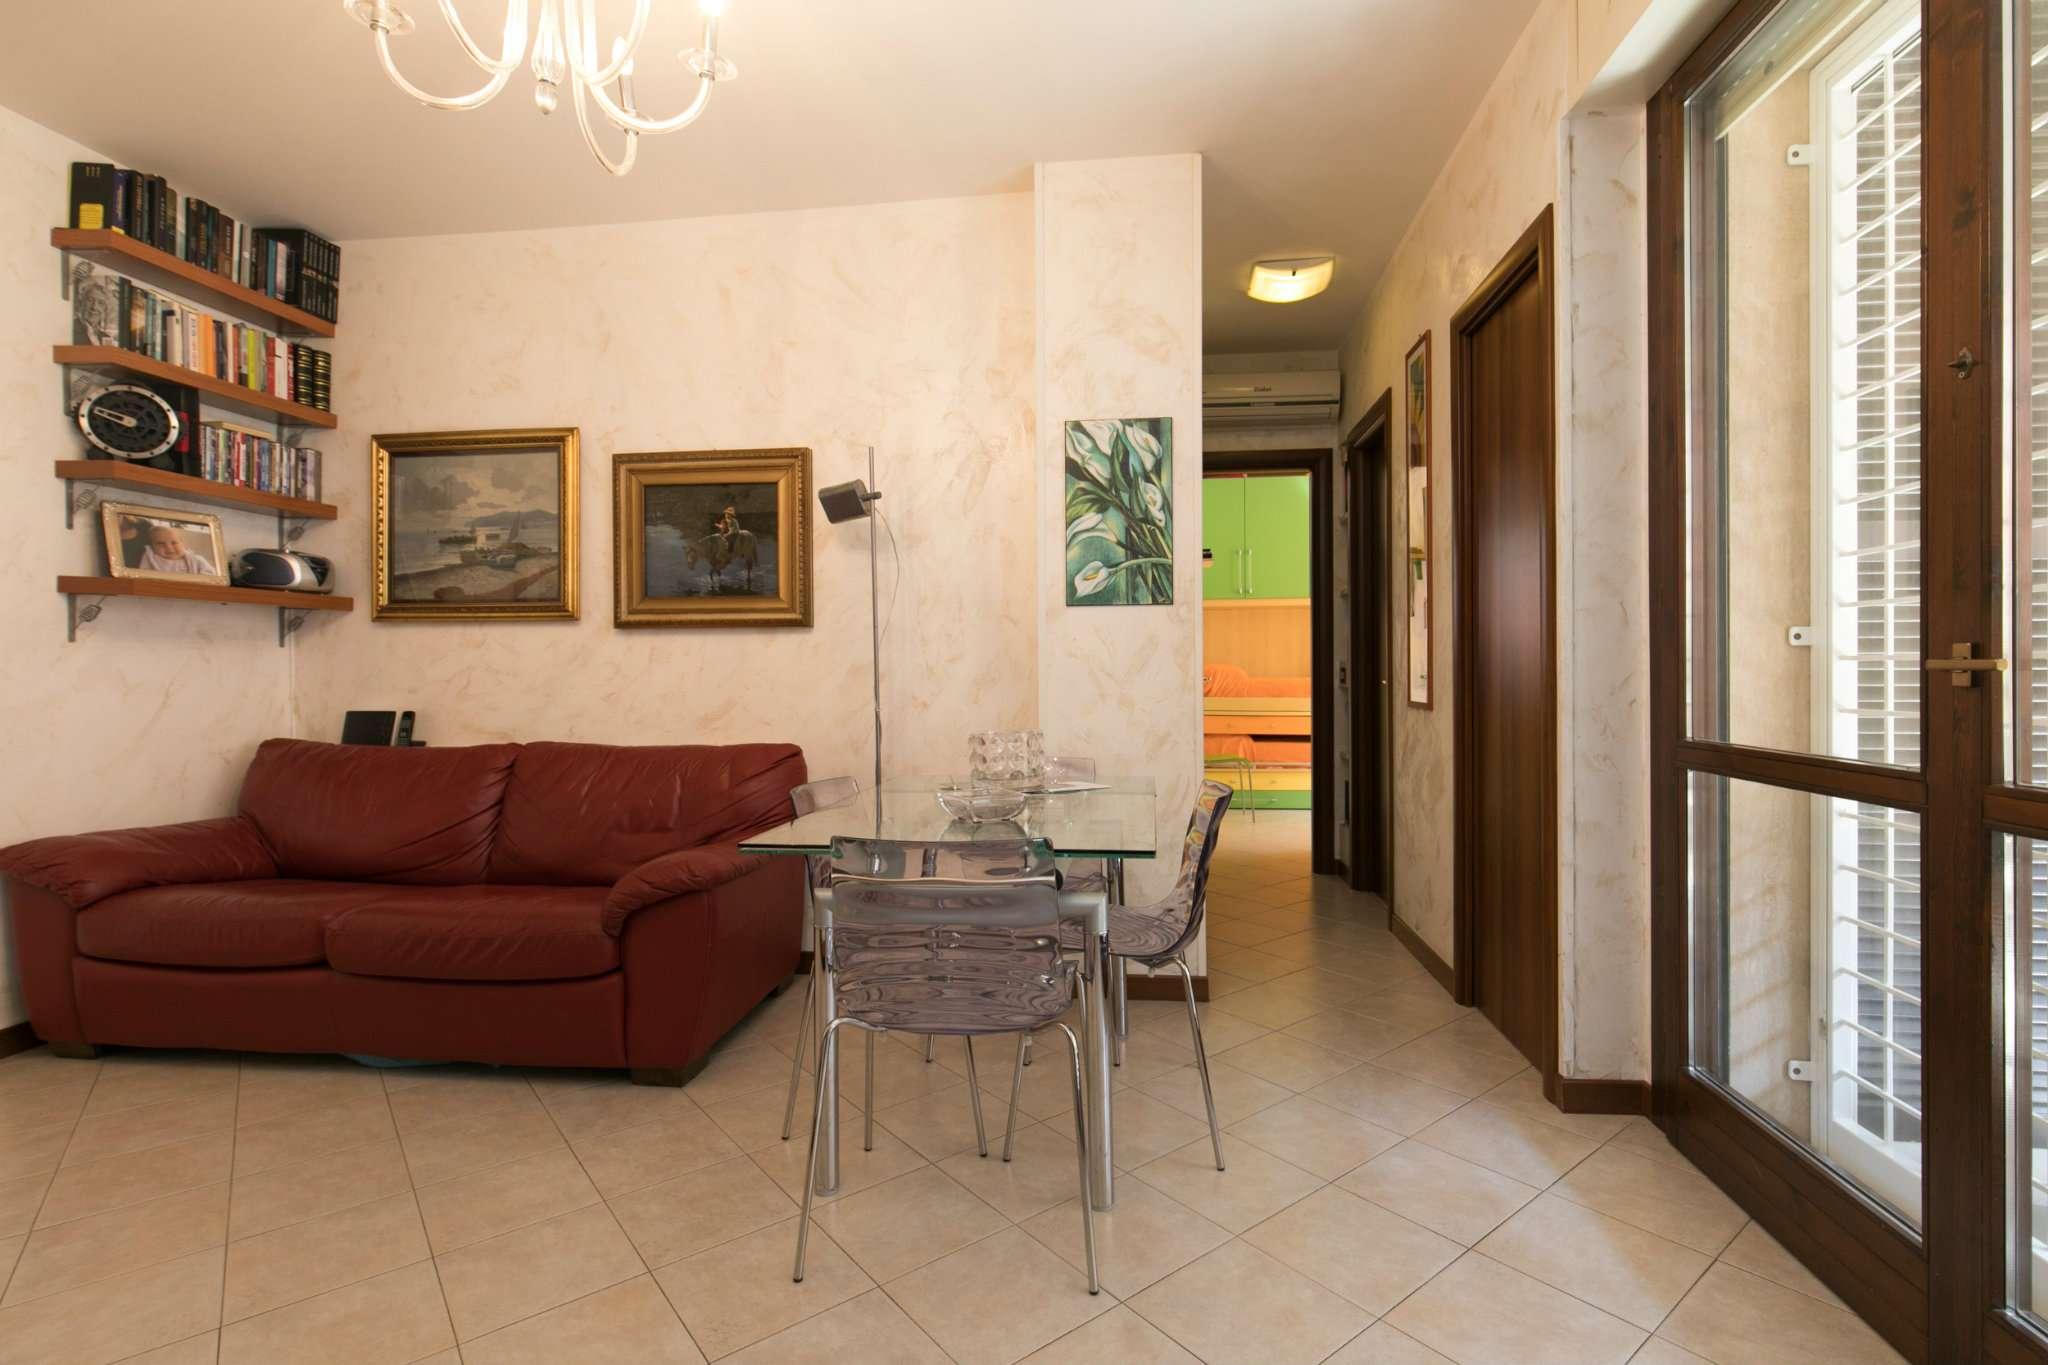 Appartamento in vendita 3 vani 65 mq.  via olivares Roma